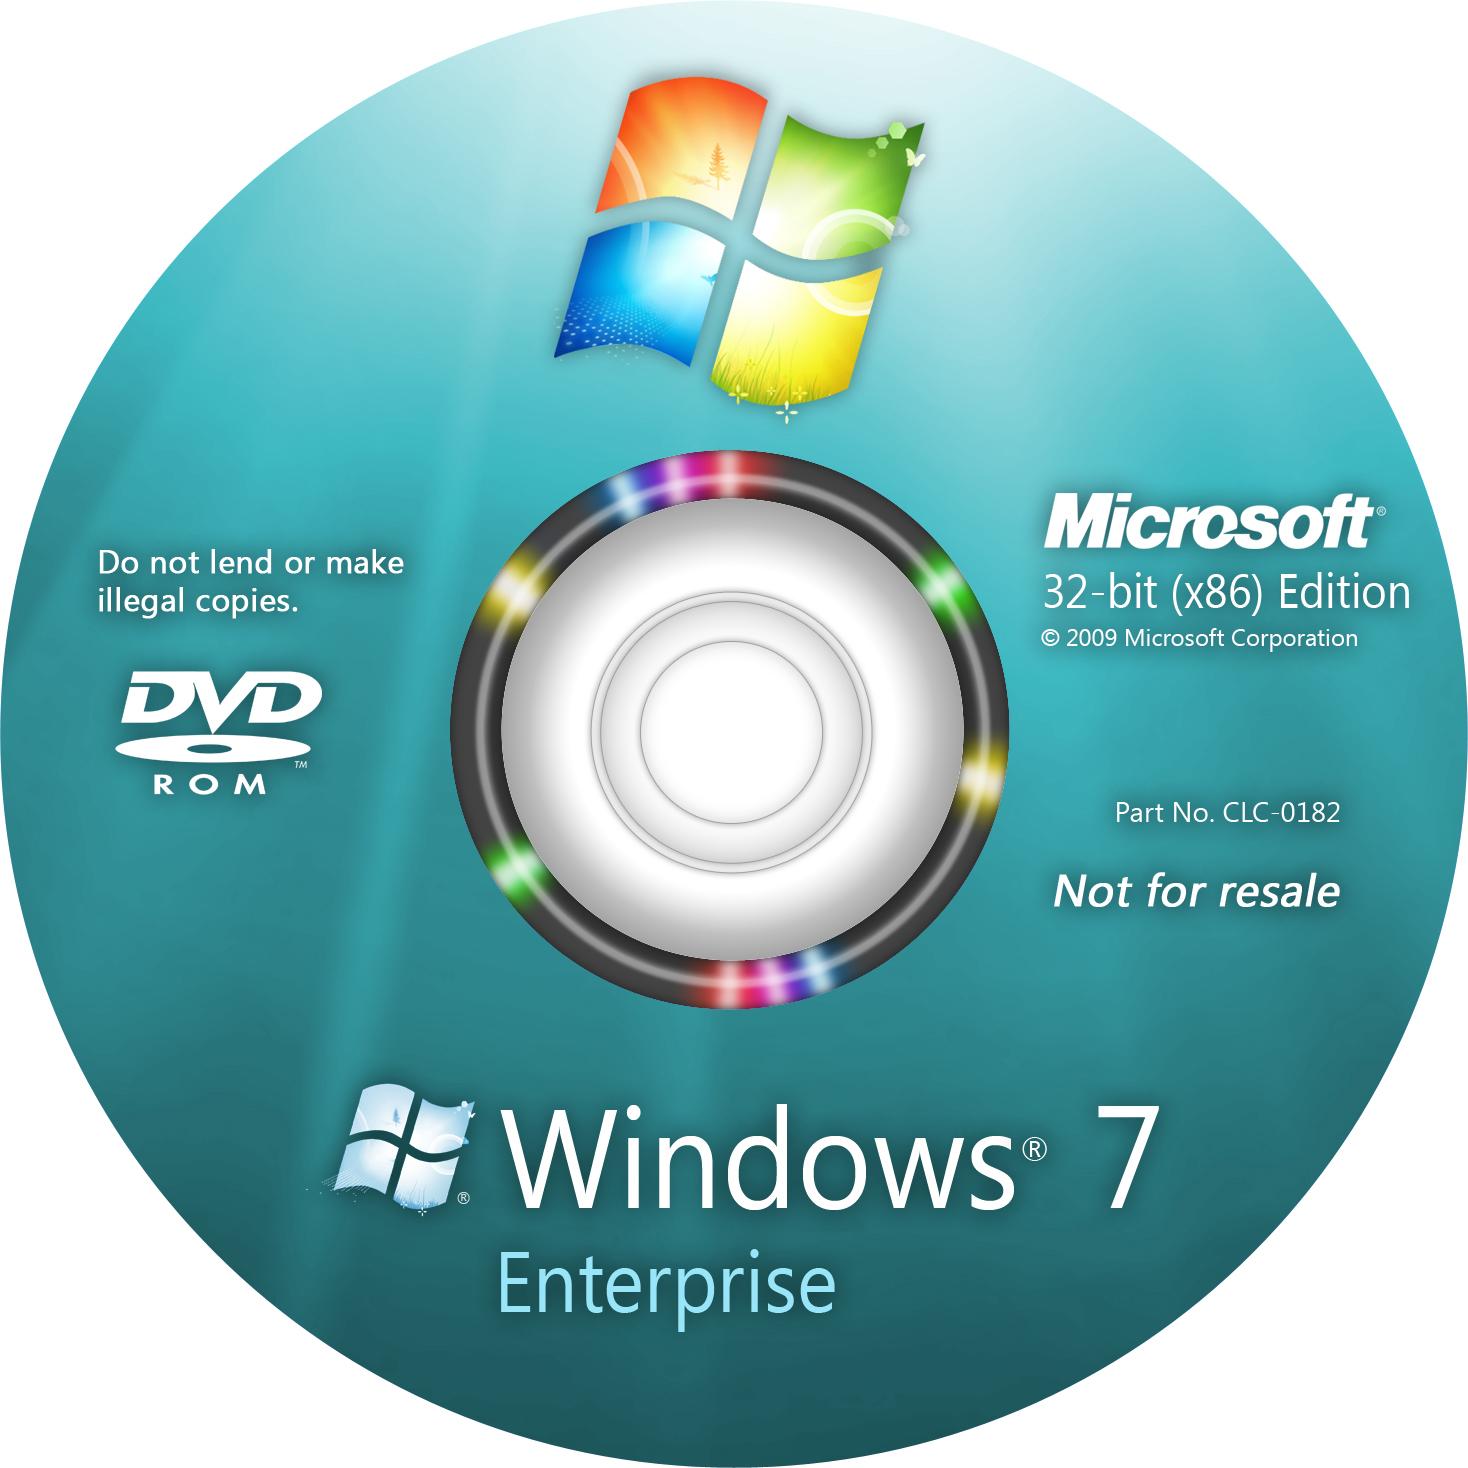 pc games free download full version for windows 7 32 bit